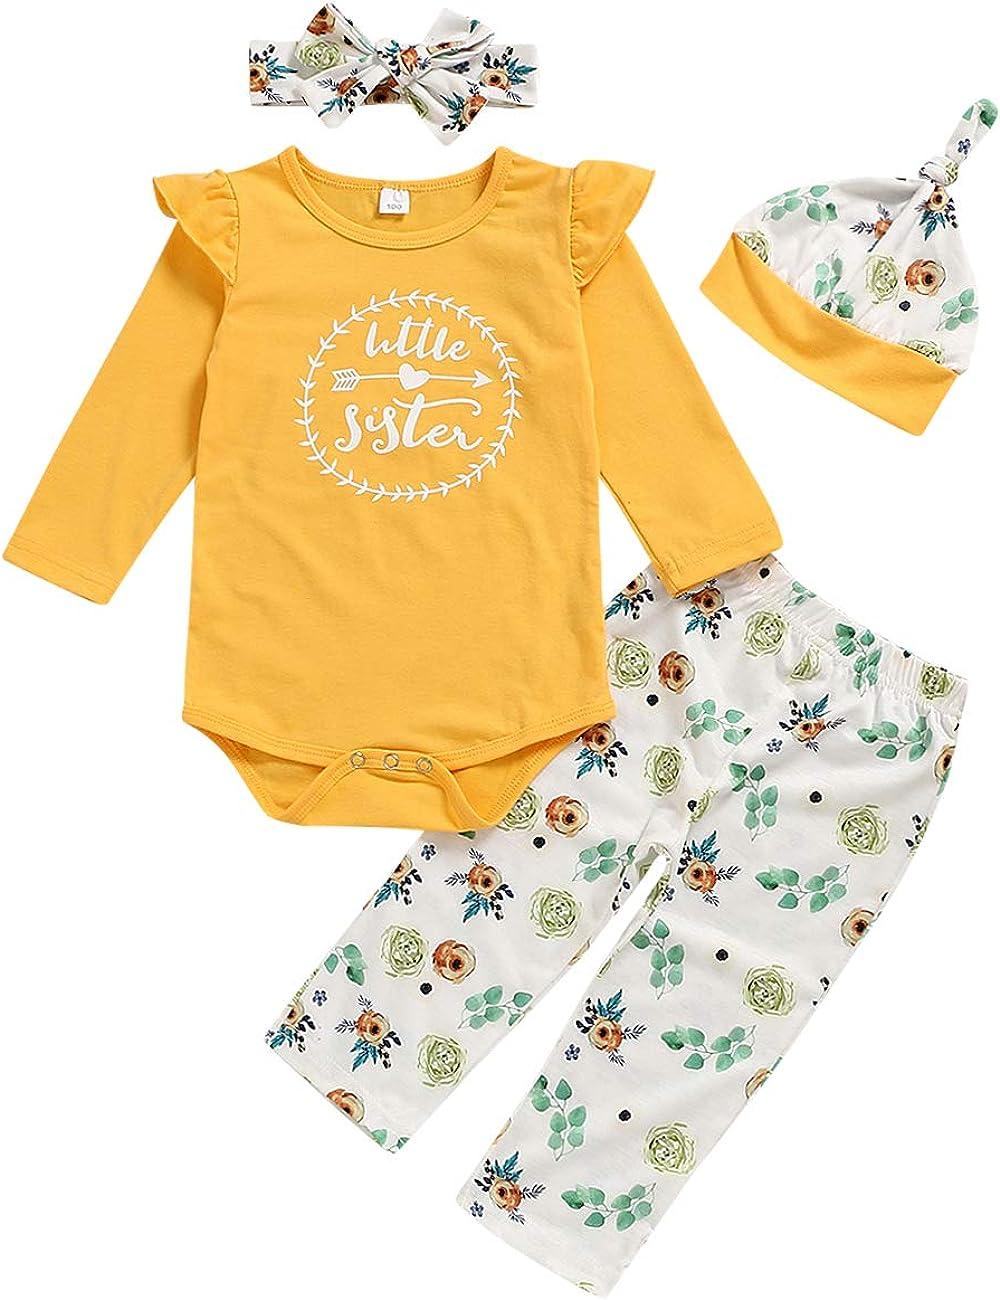 Xuefoo Infant Baby Girl Clothes Mameluco de Manga Larga Mono con Volantes Body Pantalones Florales Conjuntos con Diadema 3 Piezas Conjuntos